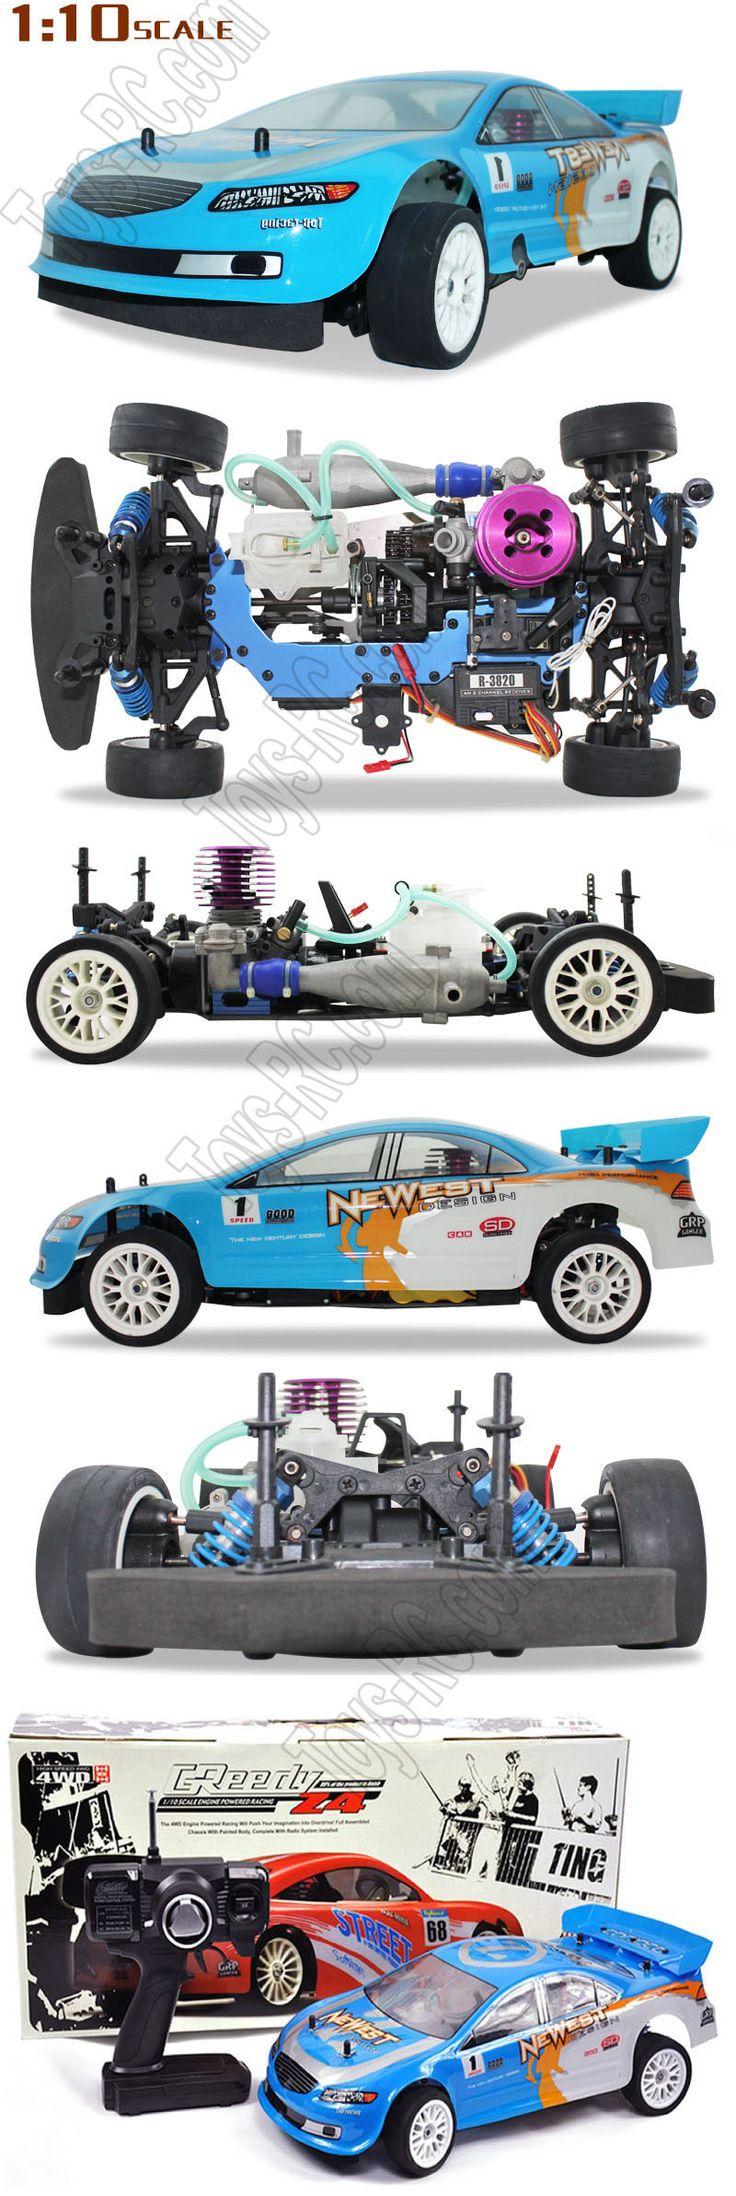 Victory hawk vh z4 1 10 4wd two speed rc nitro gas racing car